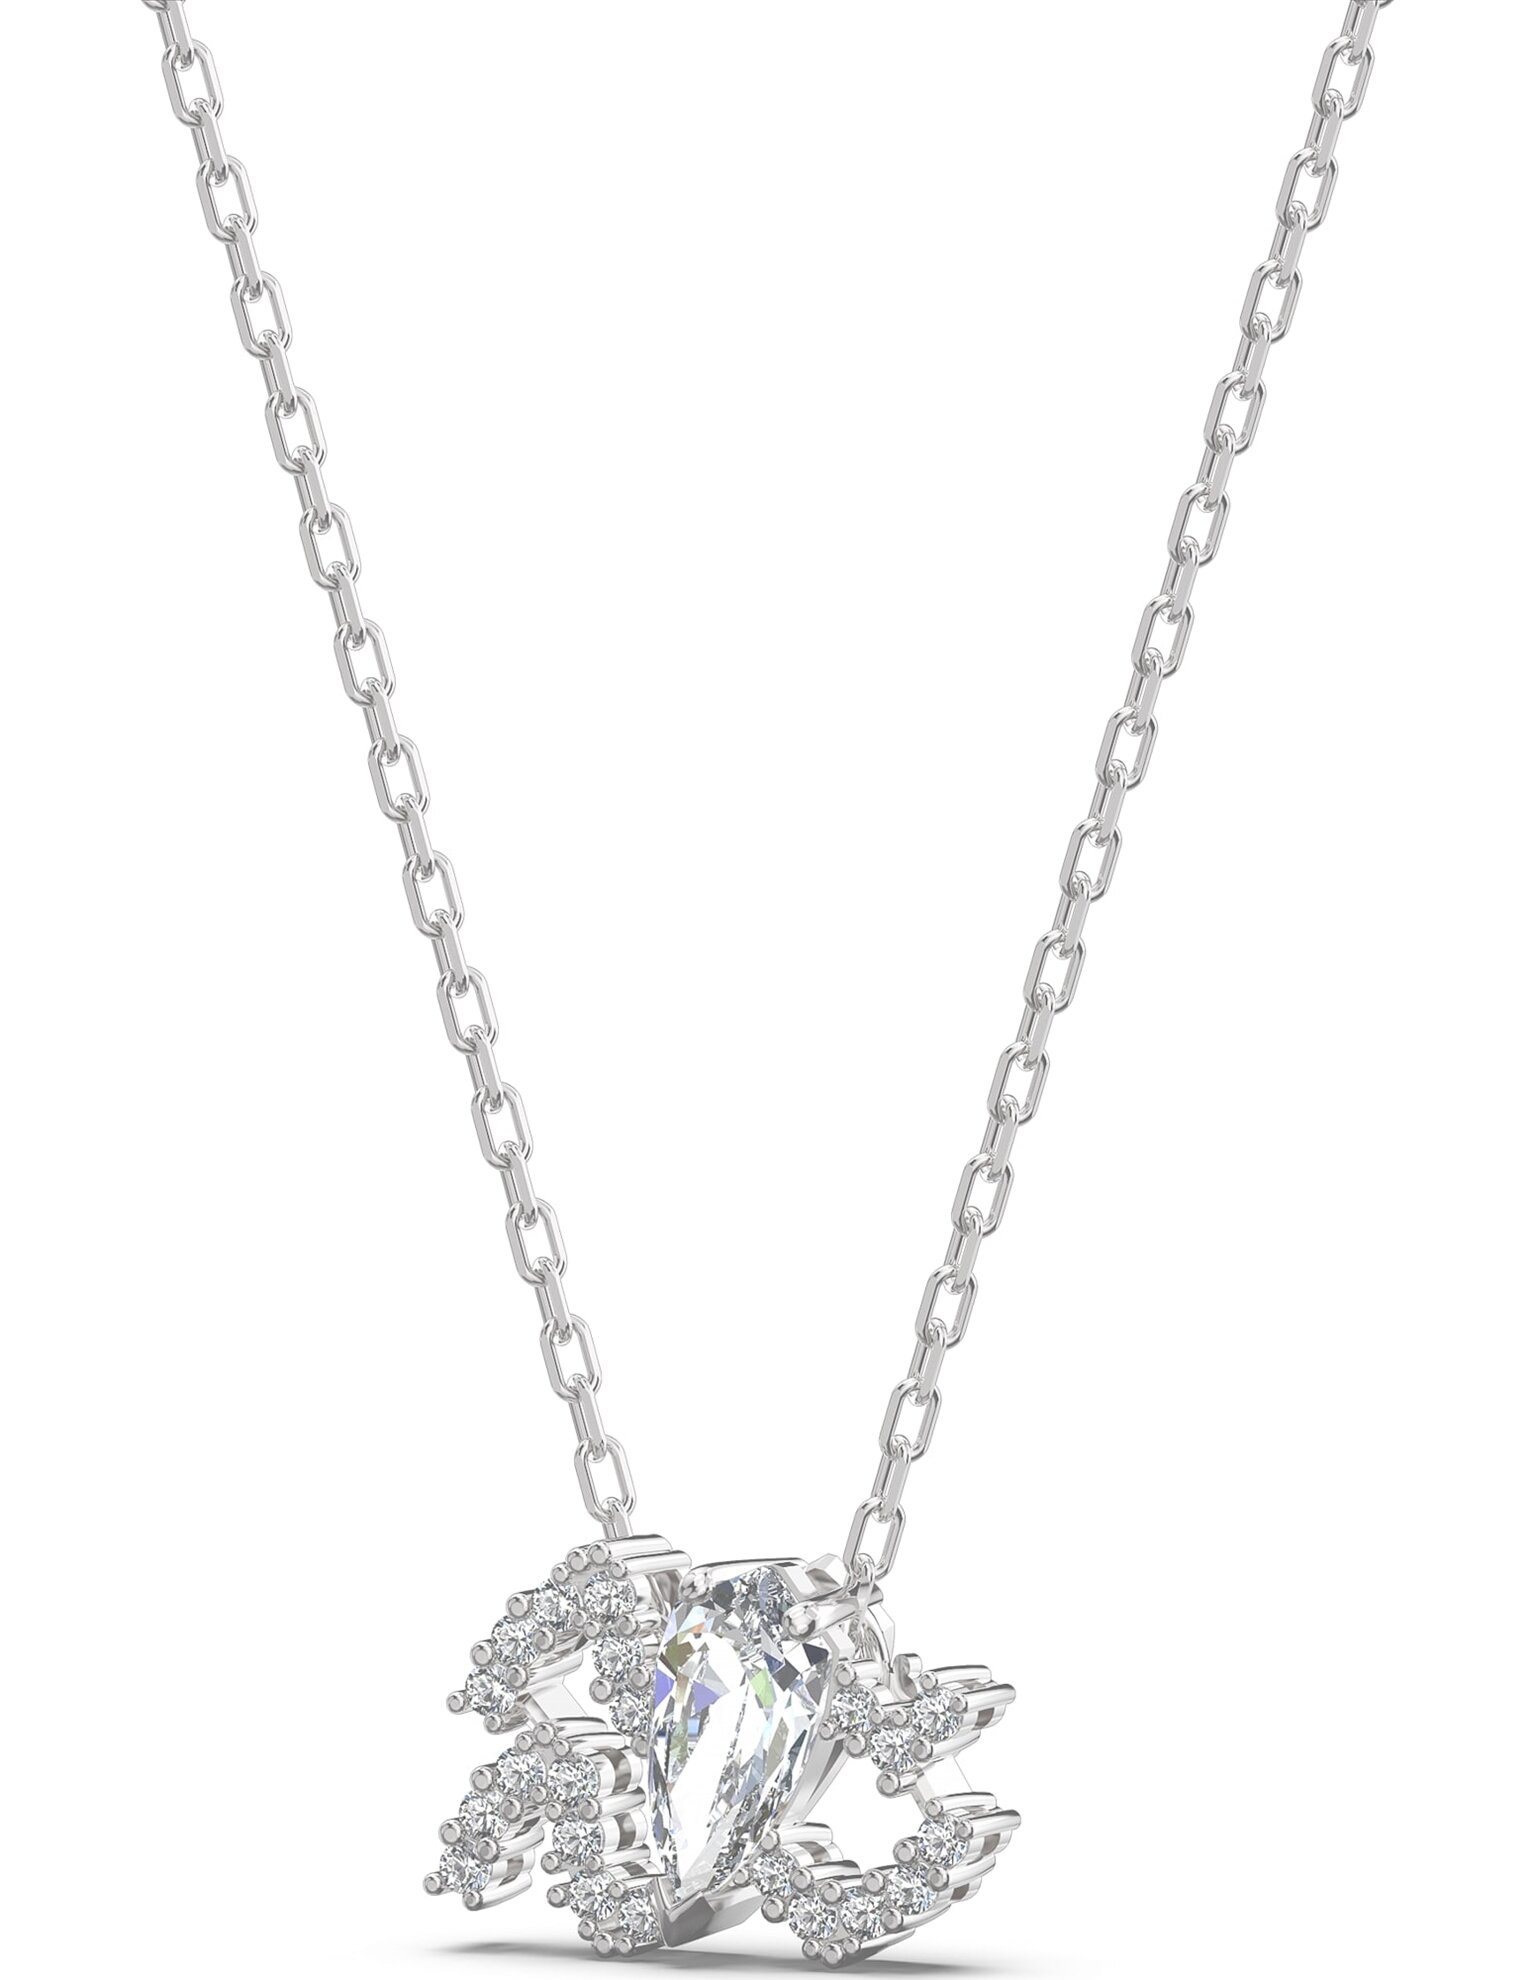 Picture of Zodiac II kolye, Kova, Beyaz, Karışık metal